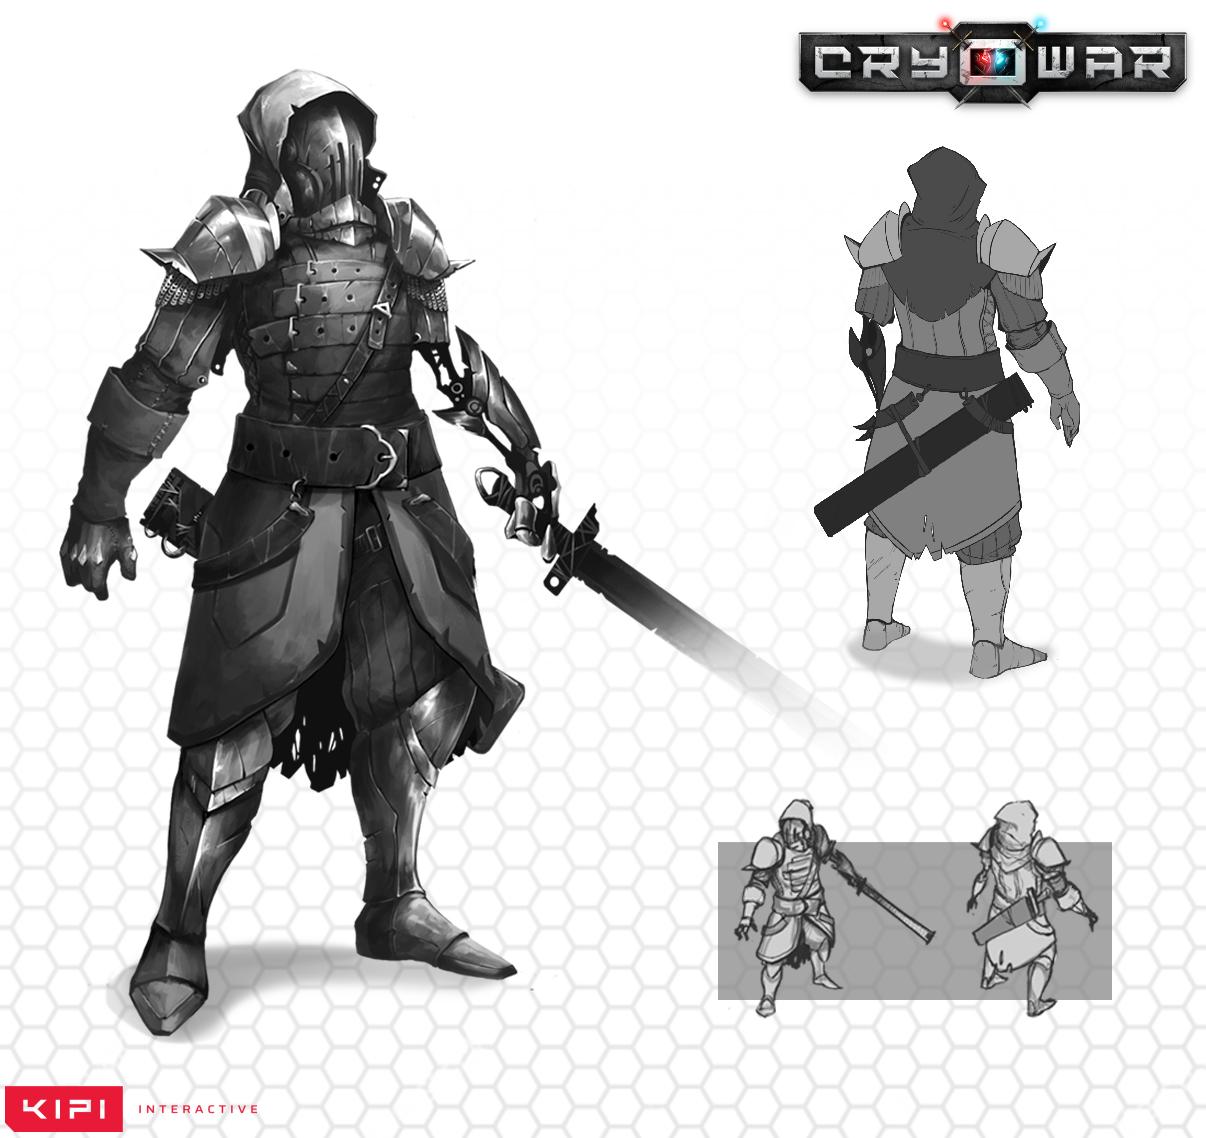 Cryowar Centurion Concept Art Front Back